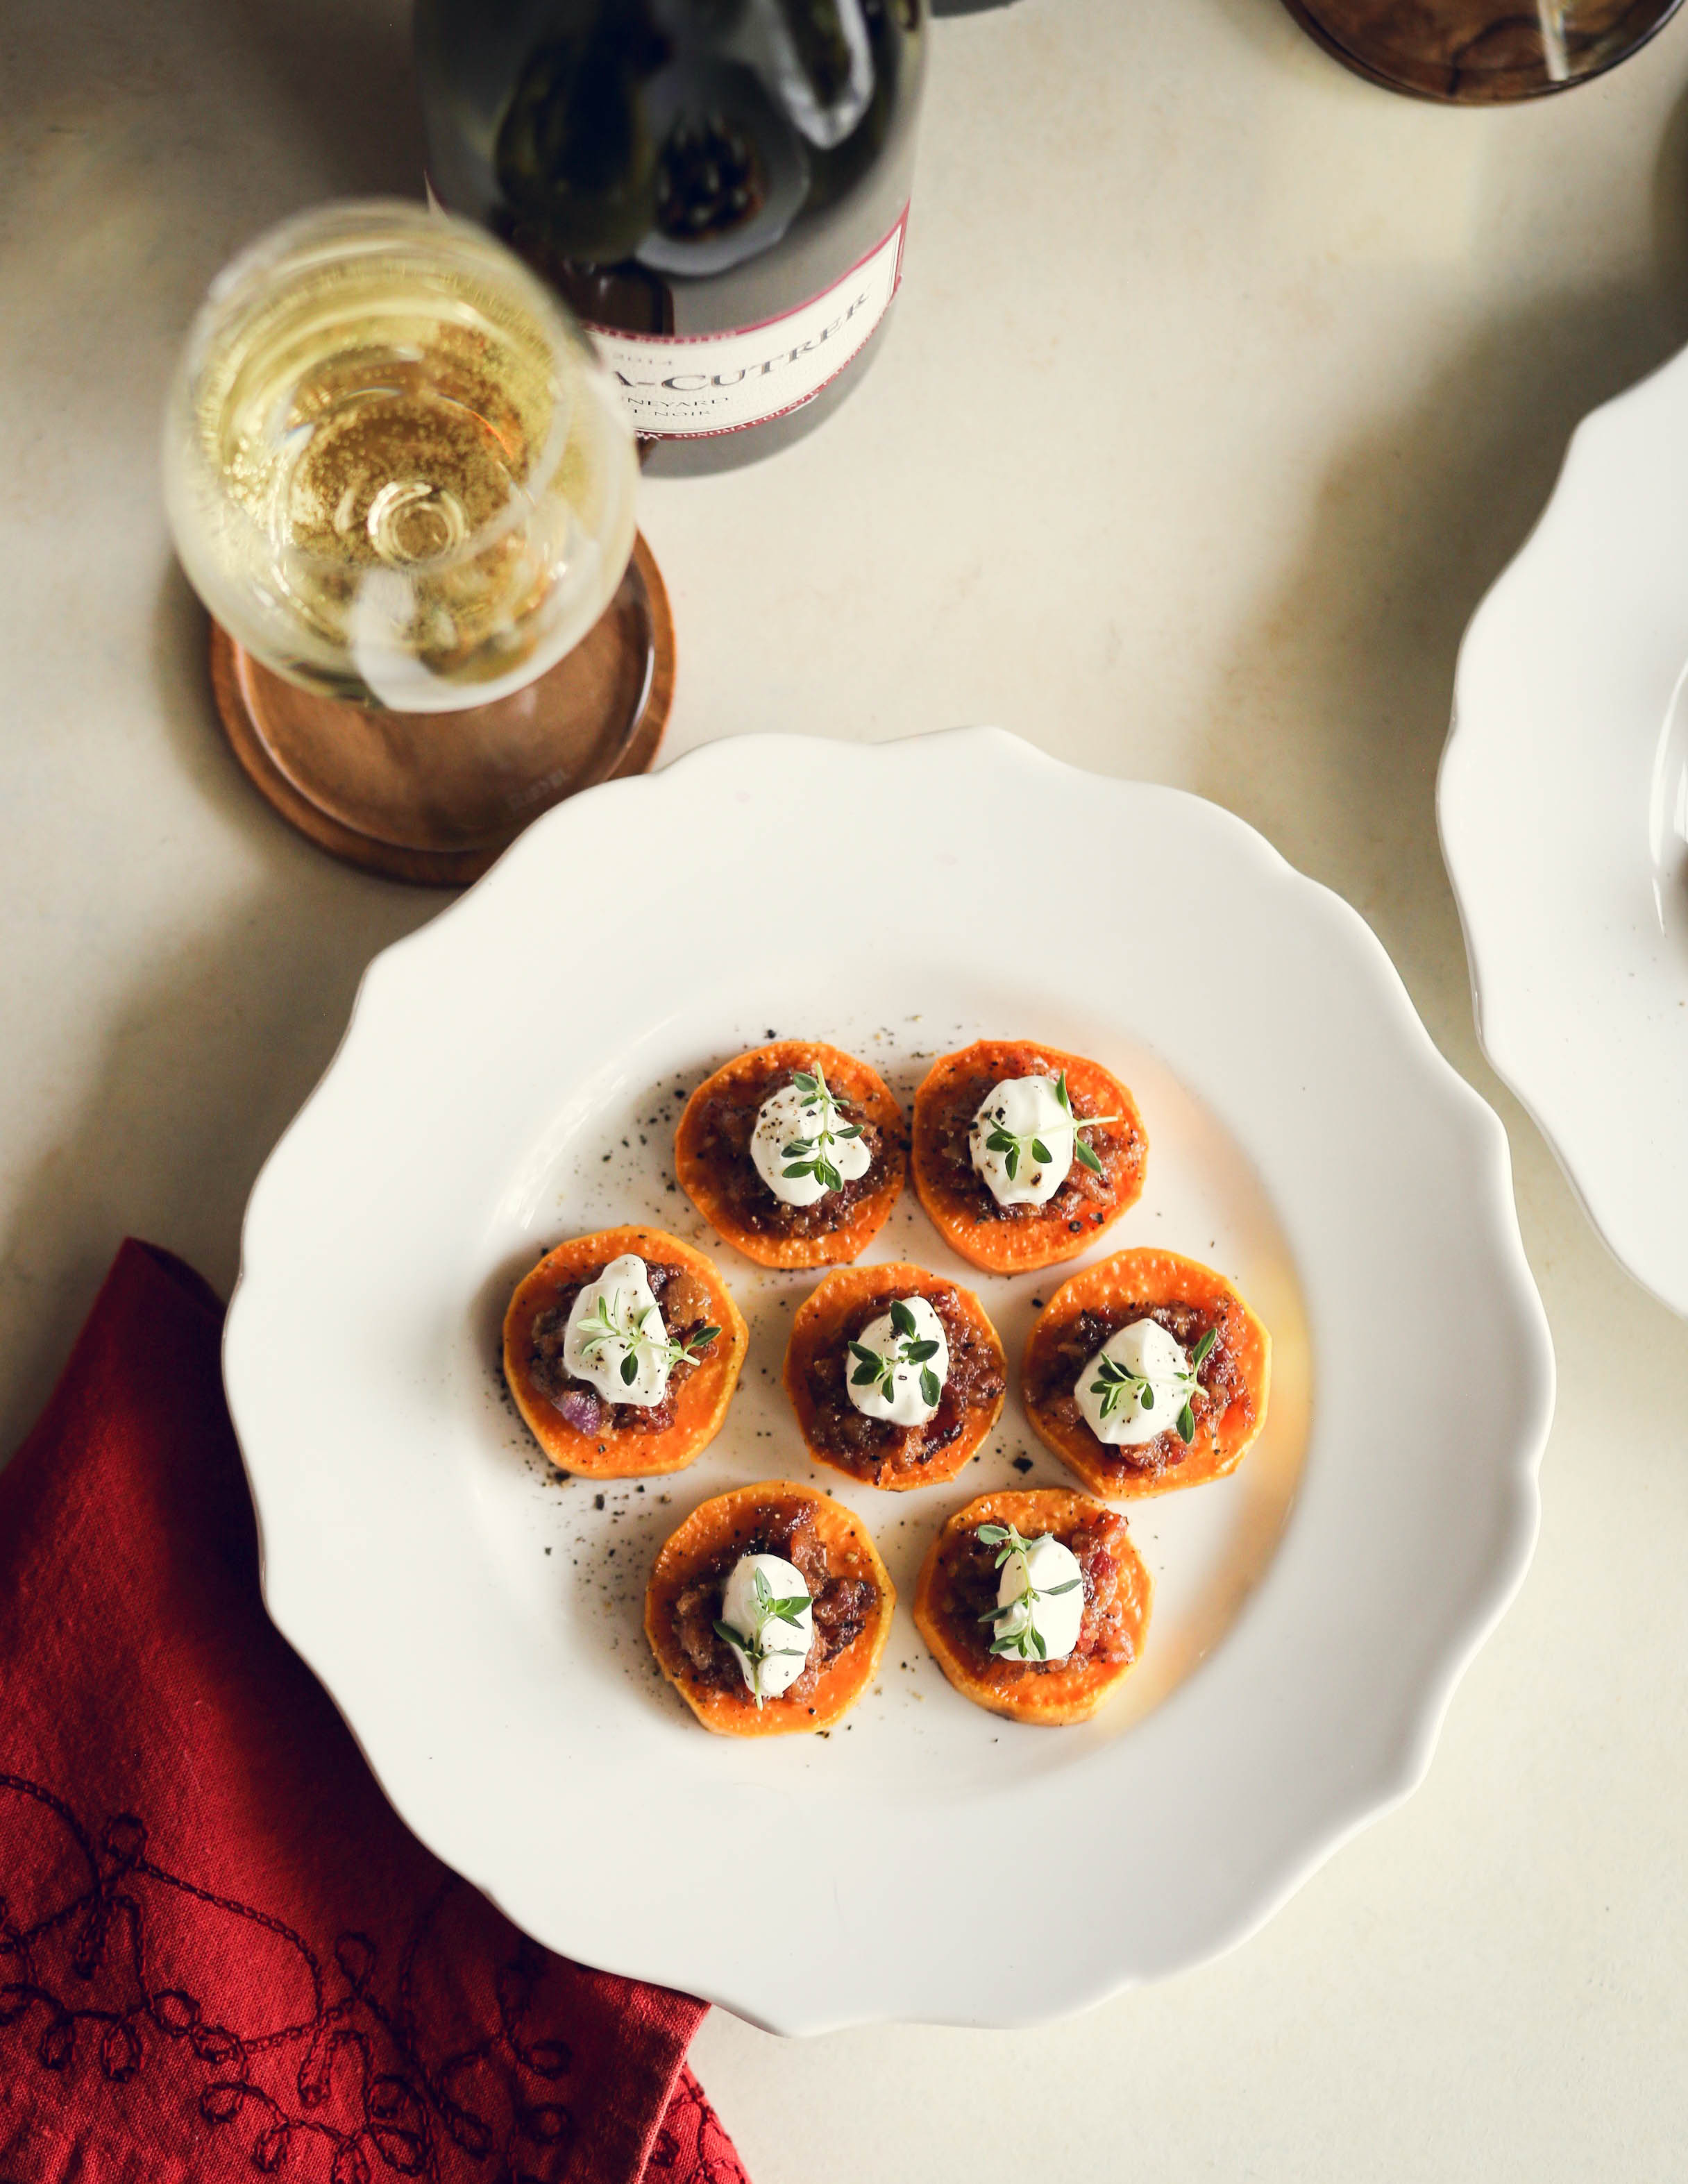 Sweet Potato Medallions with Bacon Jam